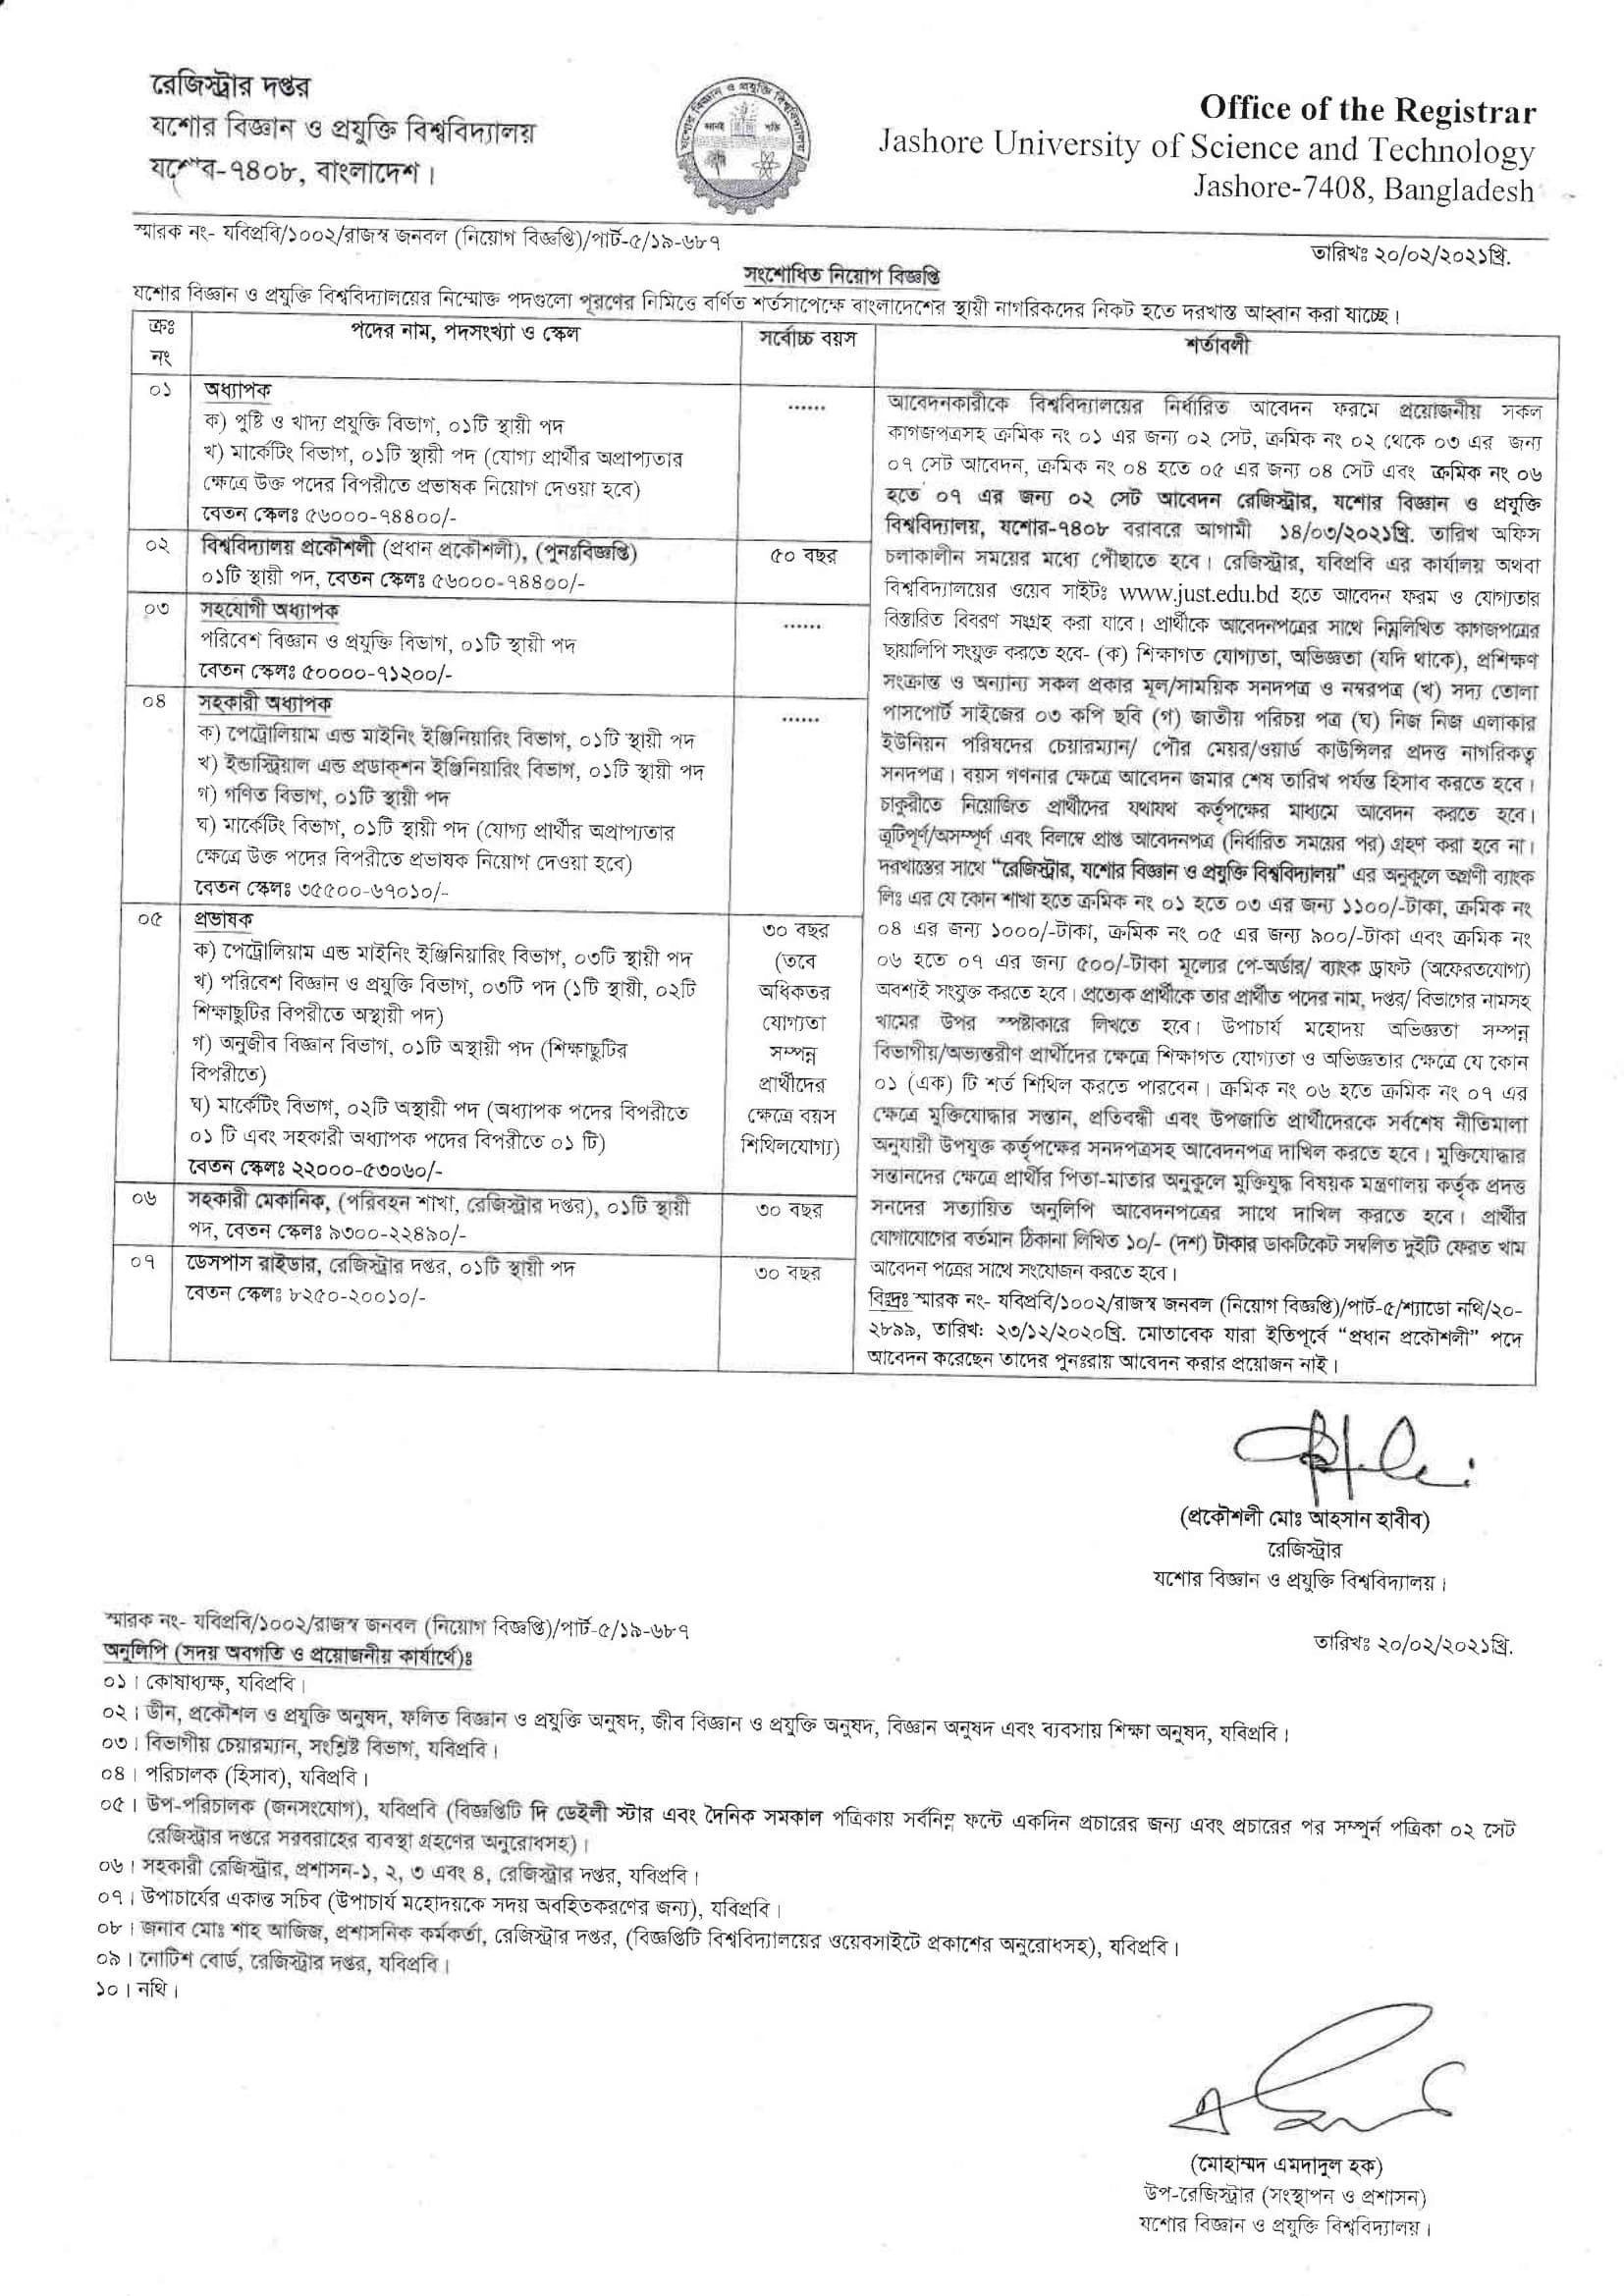 Jessore University of Science and Technology Job Circular 2021